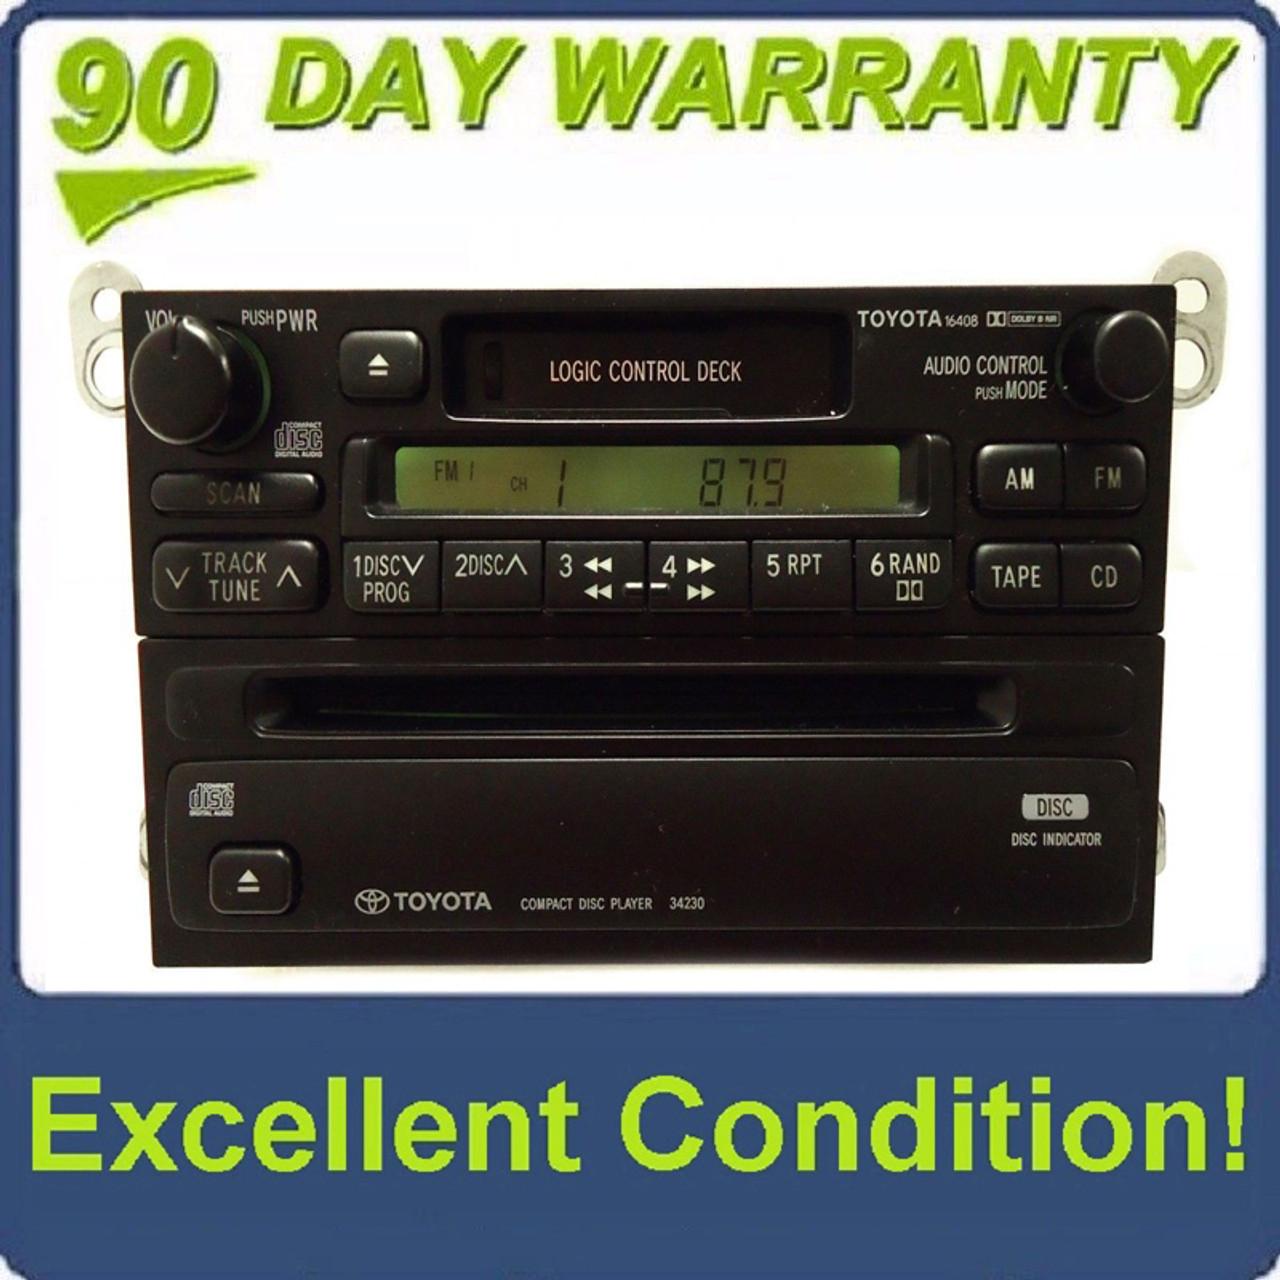 1999 toyota camry radio reset